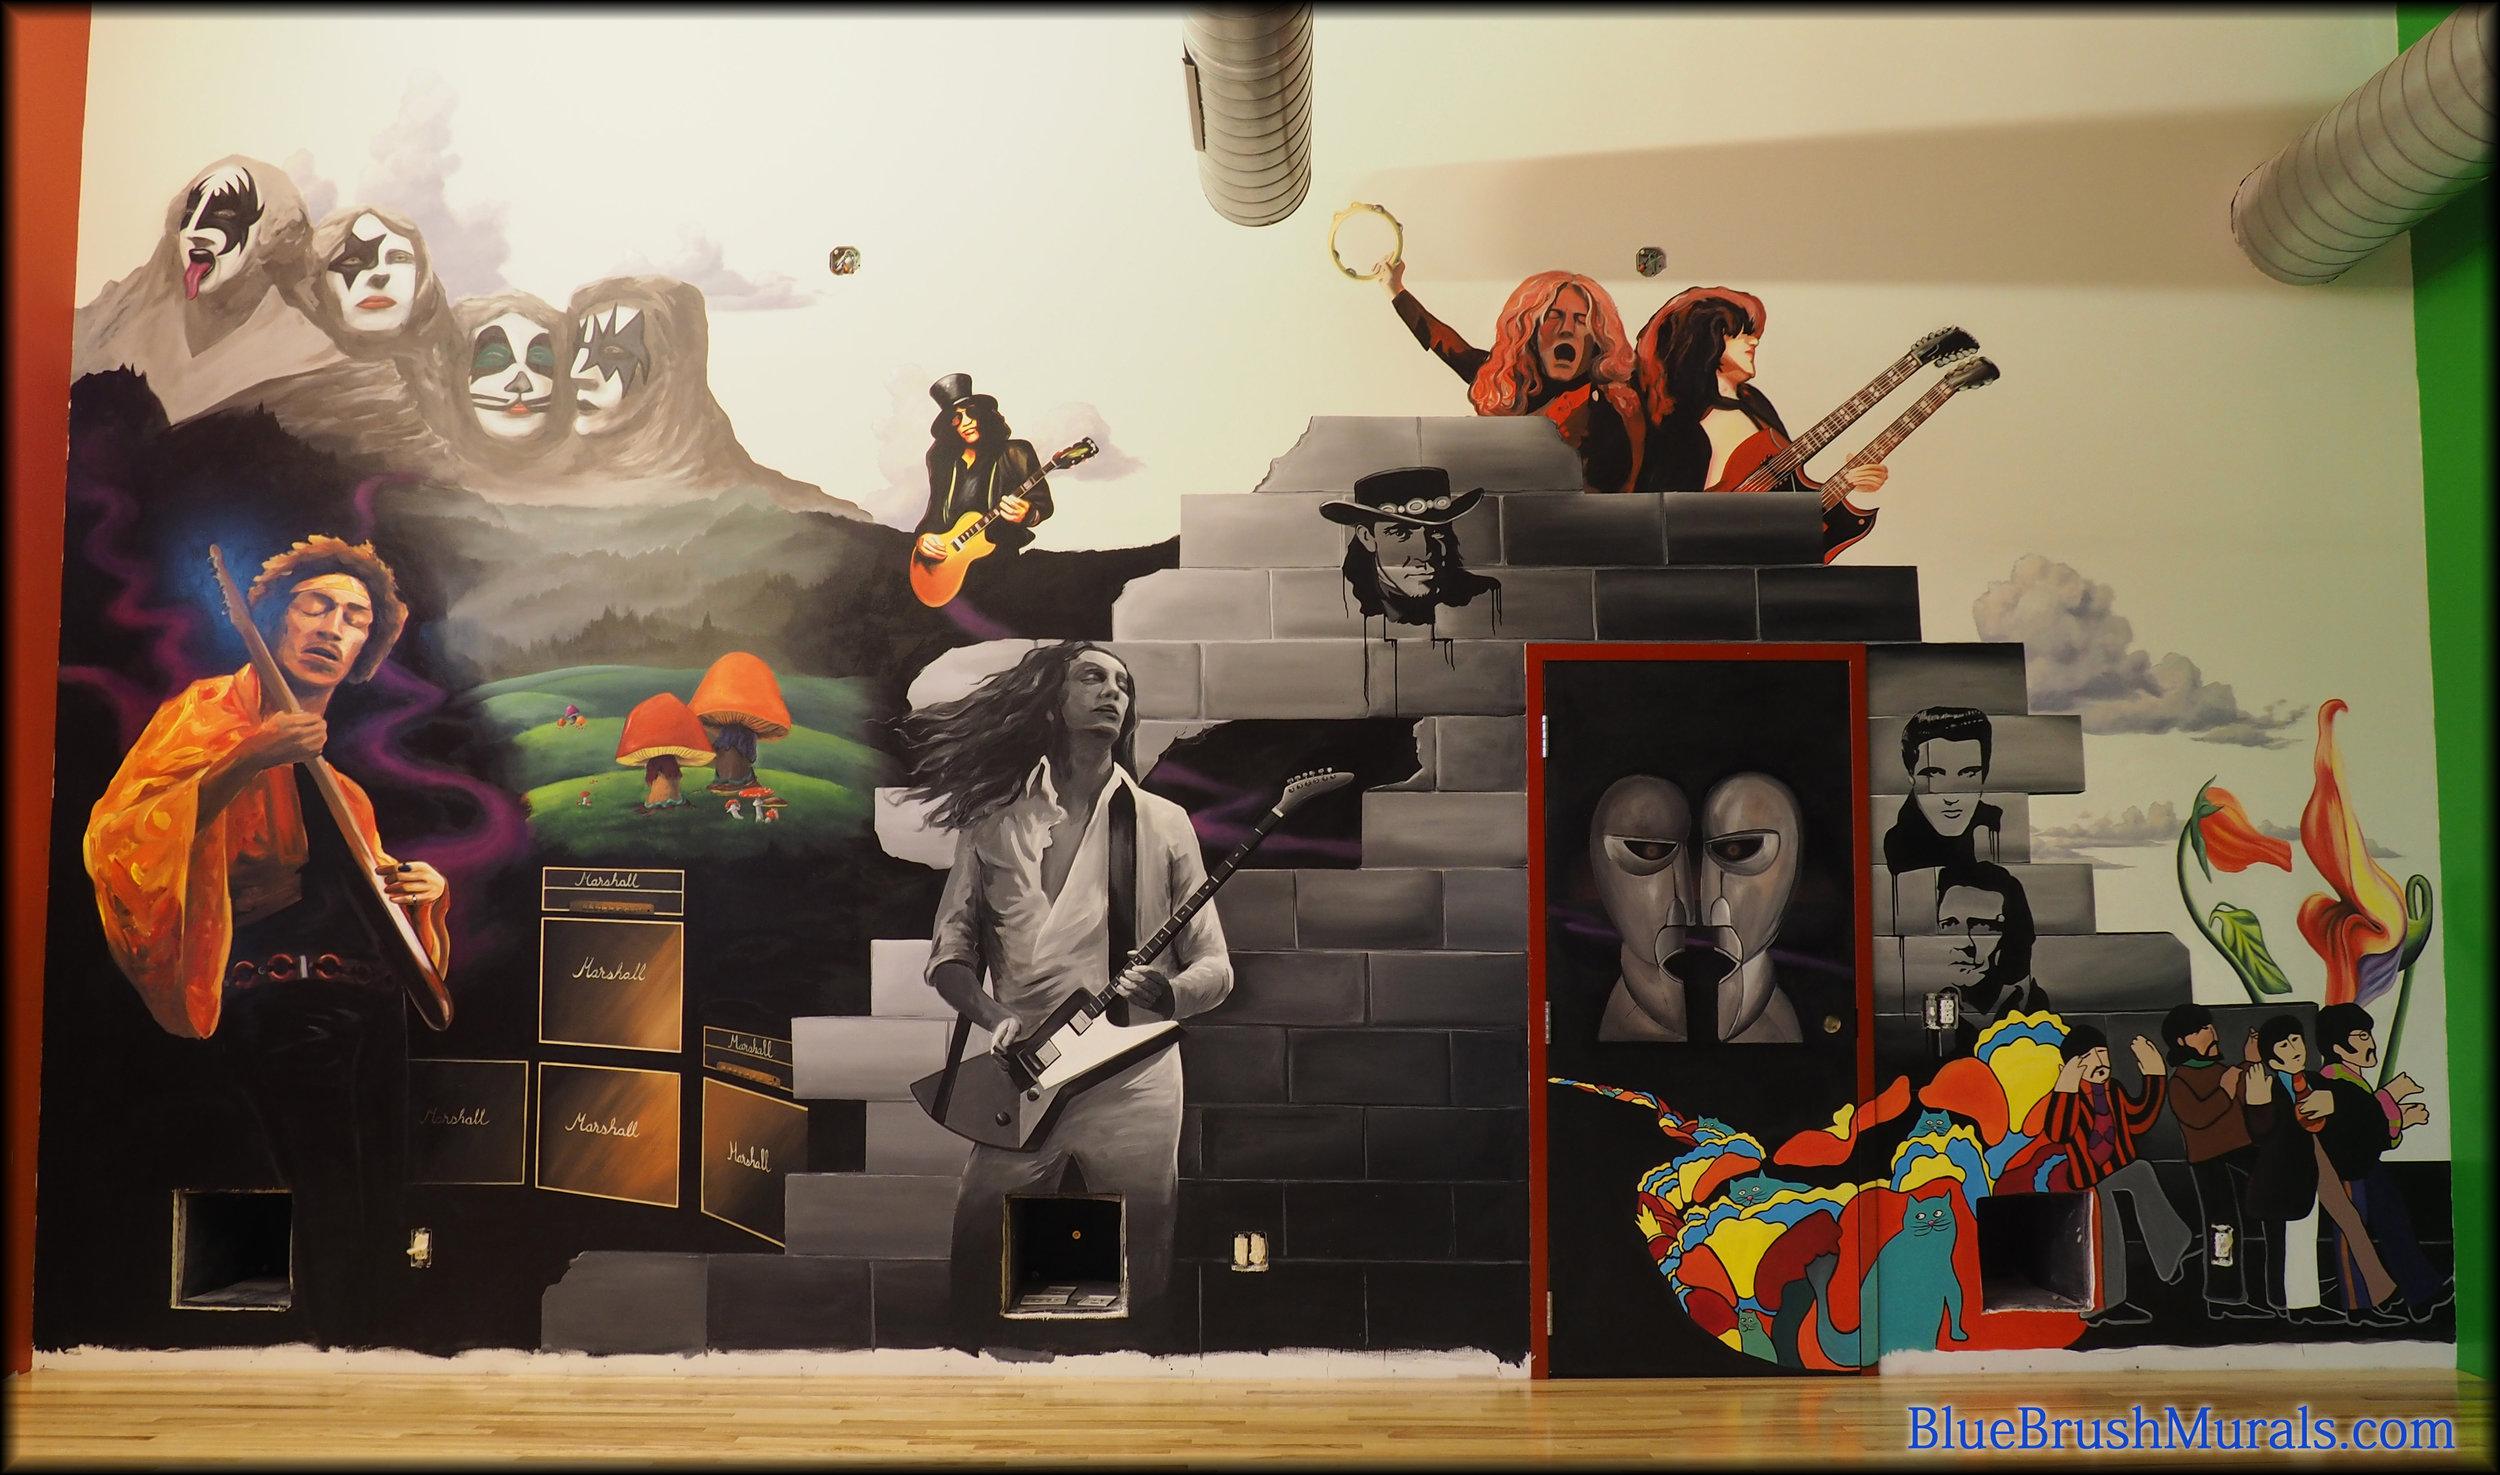 Jam Mural 24x14'